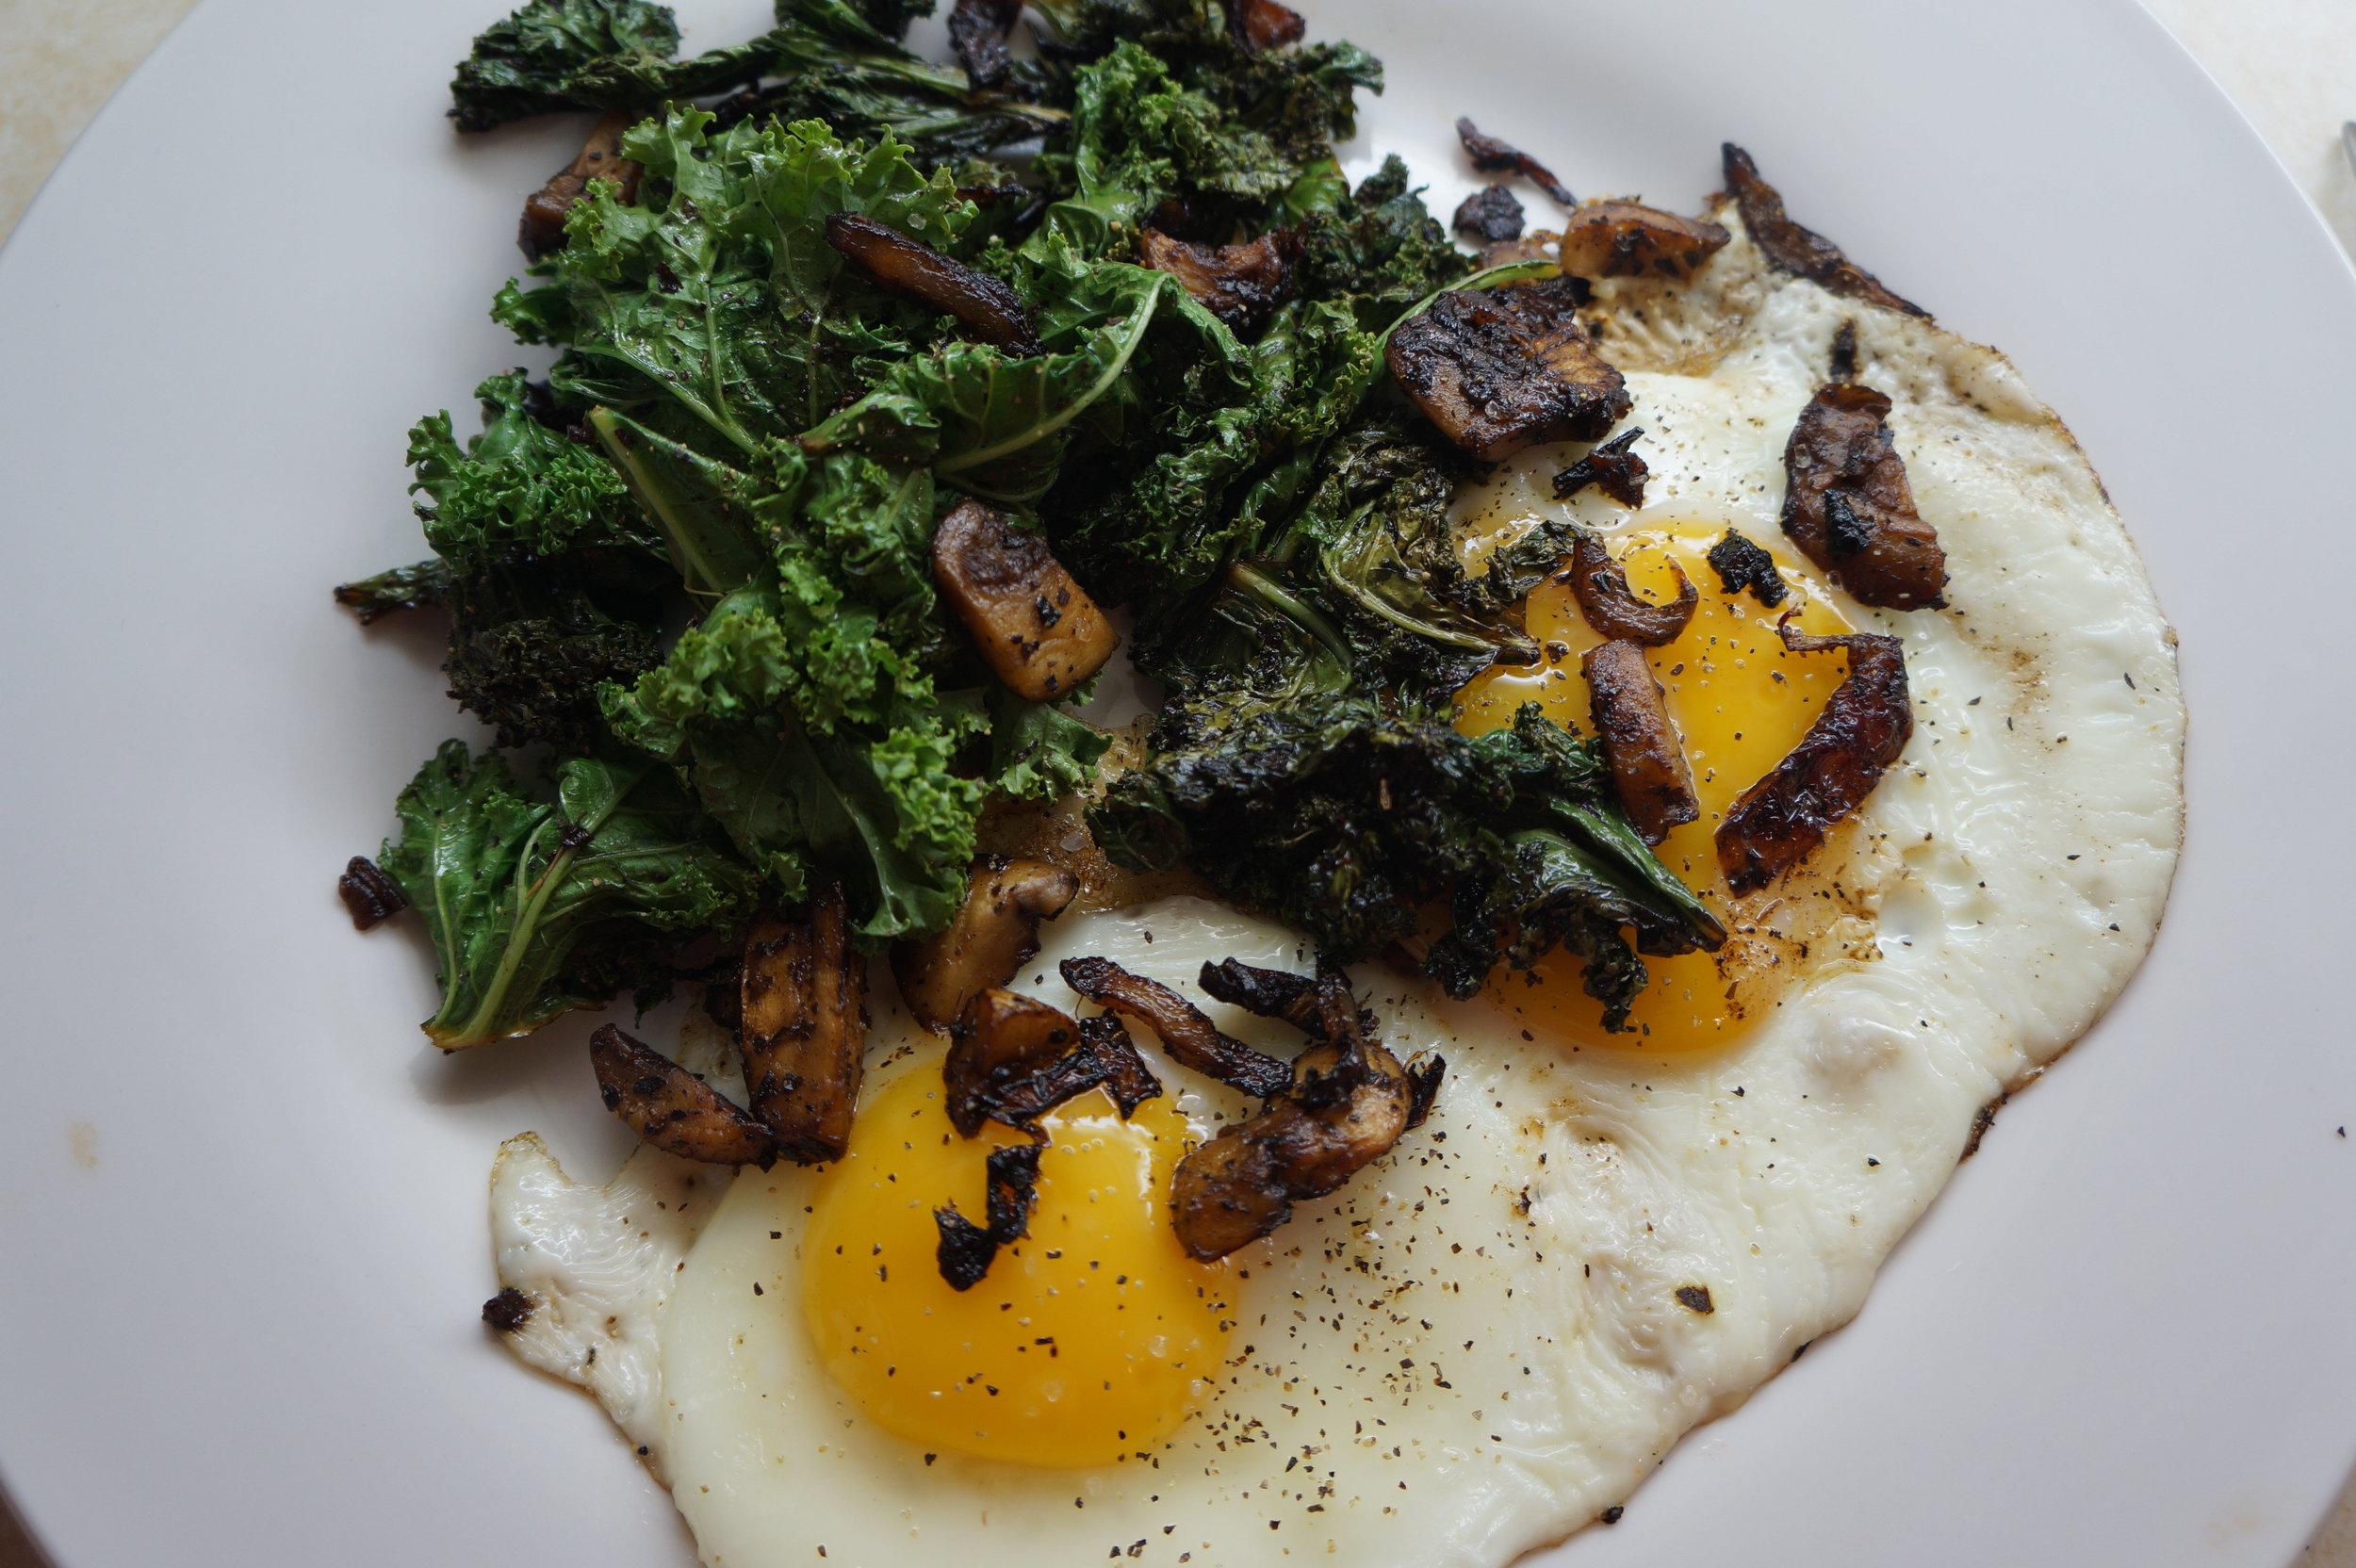 Andrea Fenise shares Sauteed Kale and Mushroom with Eggs Recipe